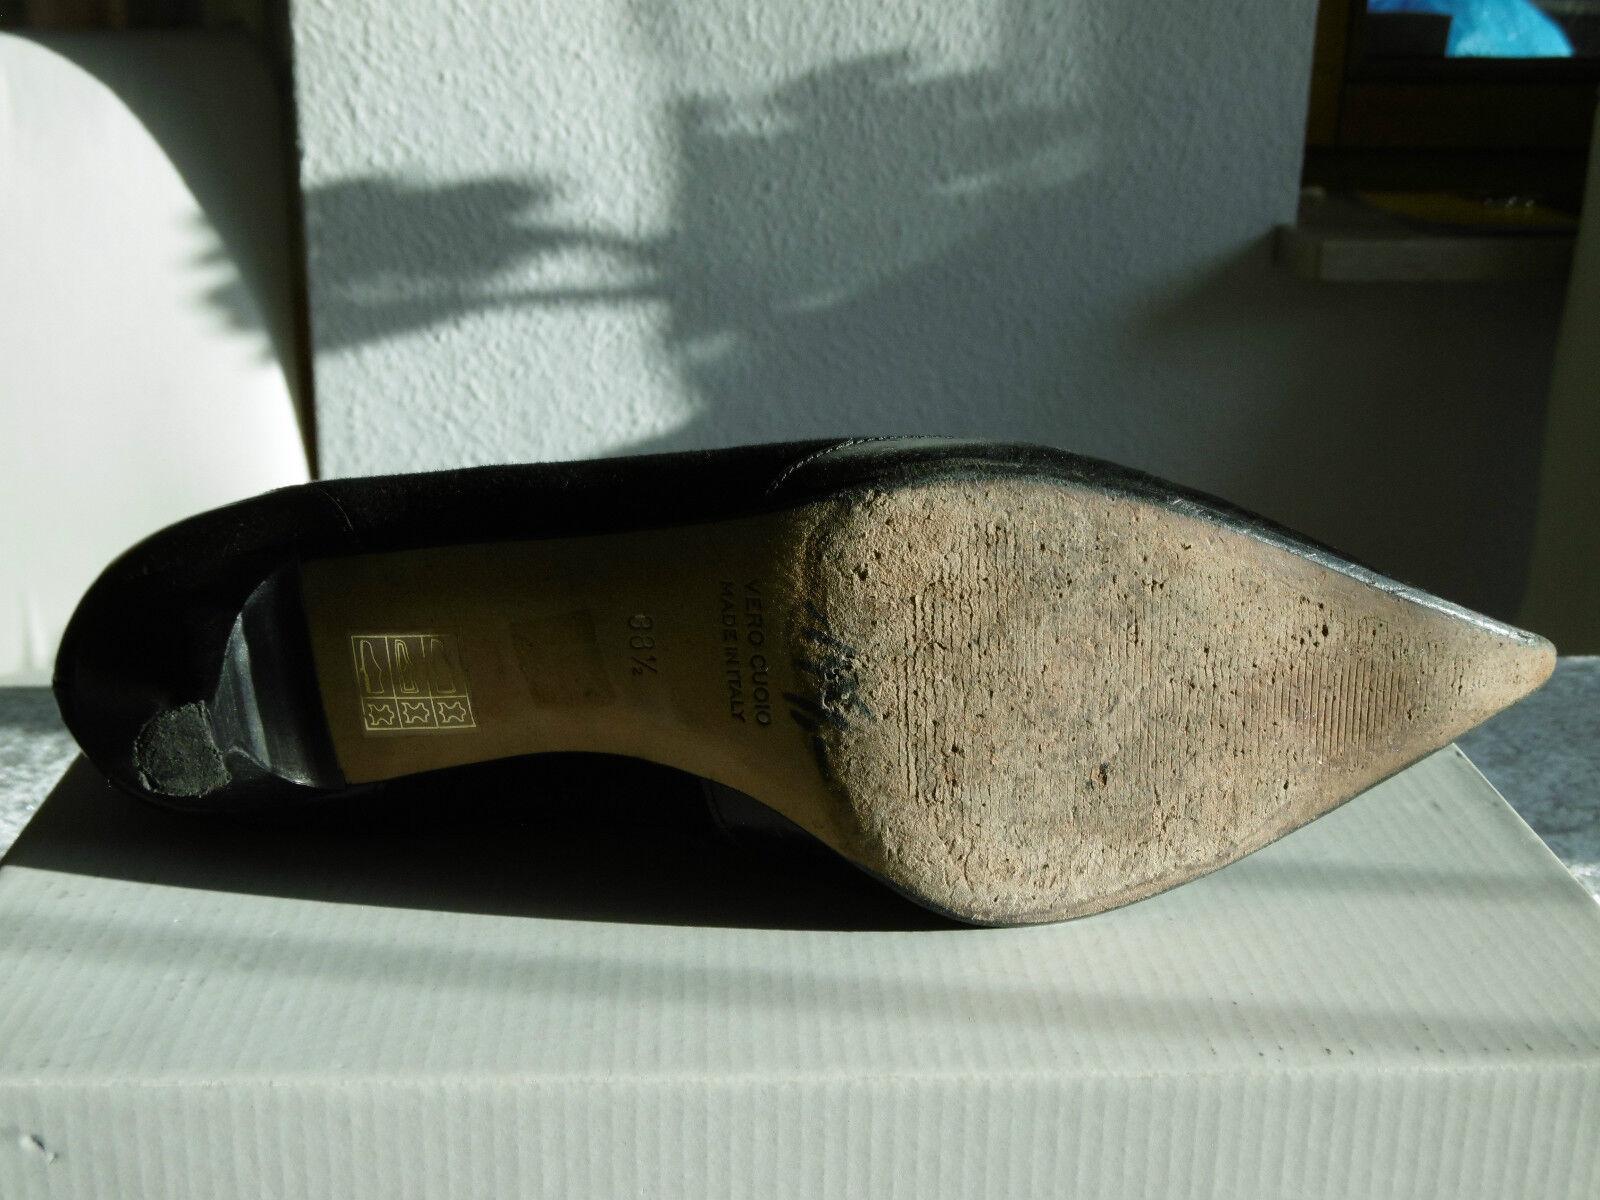 FABIO Gr RUSCONI  Stiefelette schwarz Gr FABIO 38,5 Alles Leder  made Italy NP 199.- neuw 090604